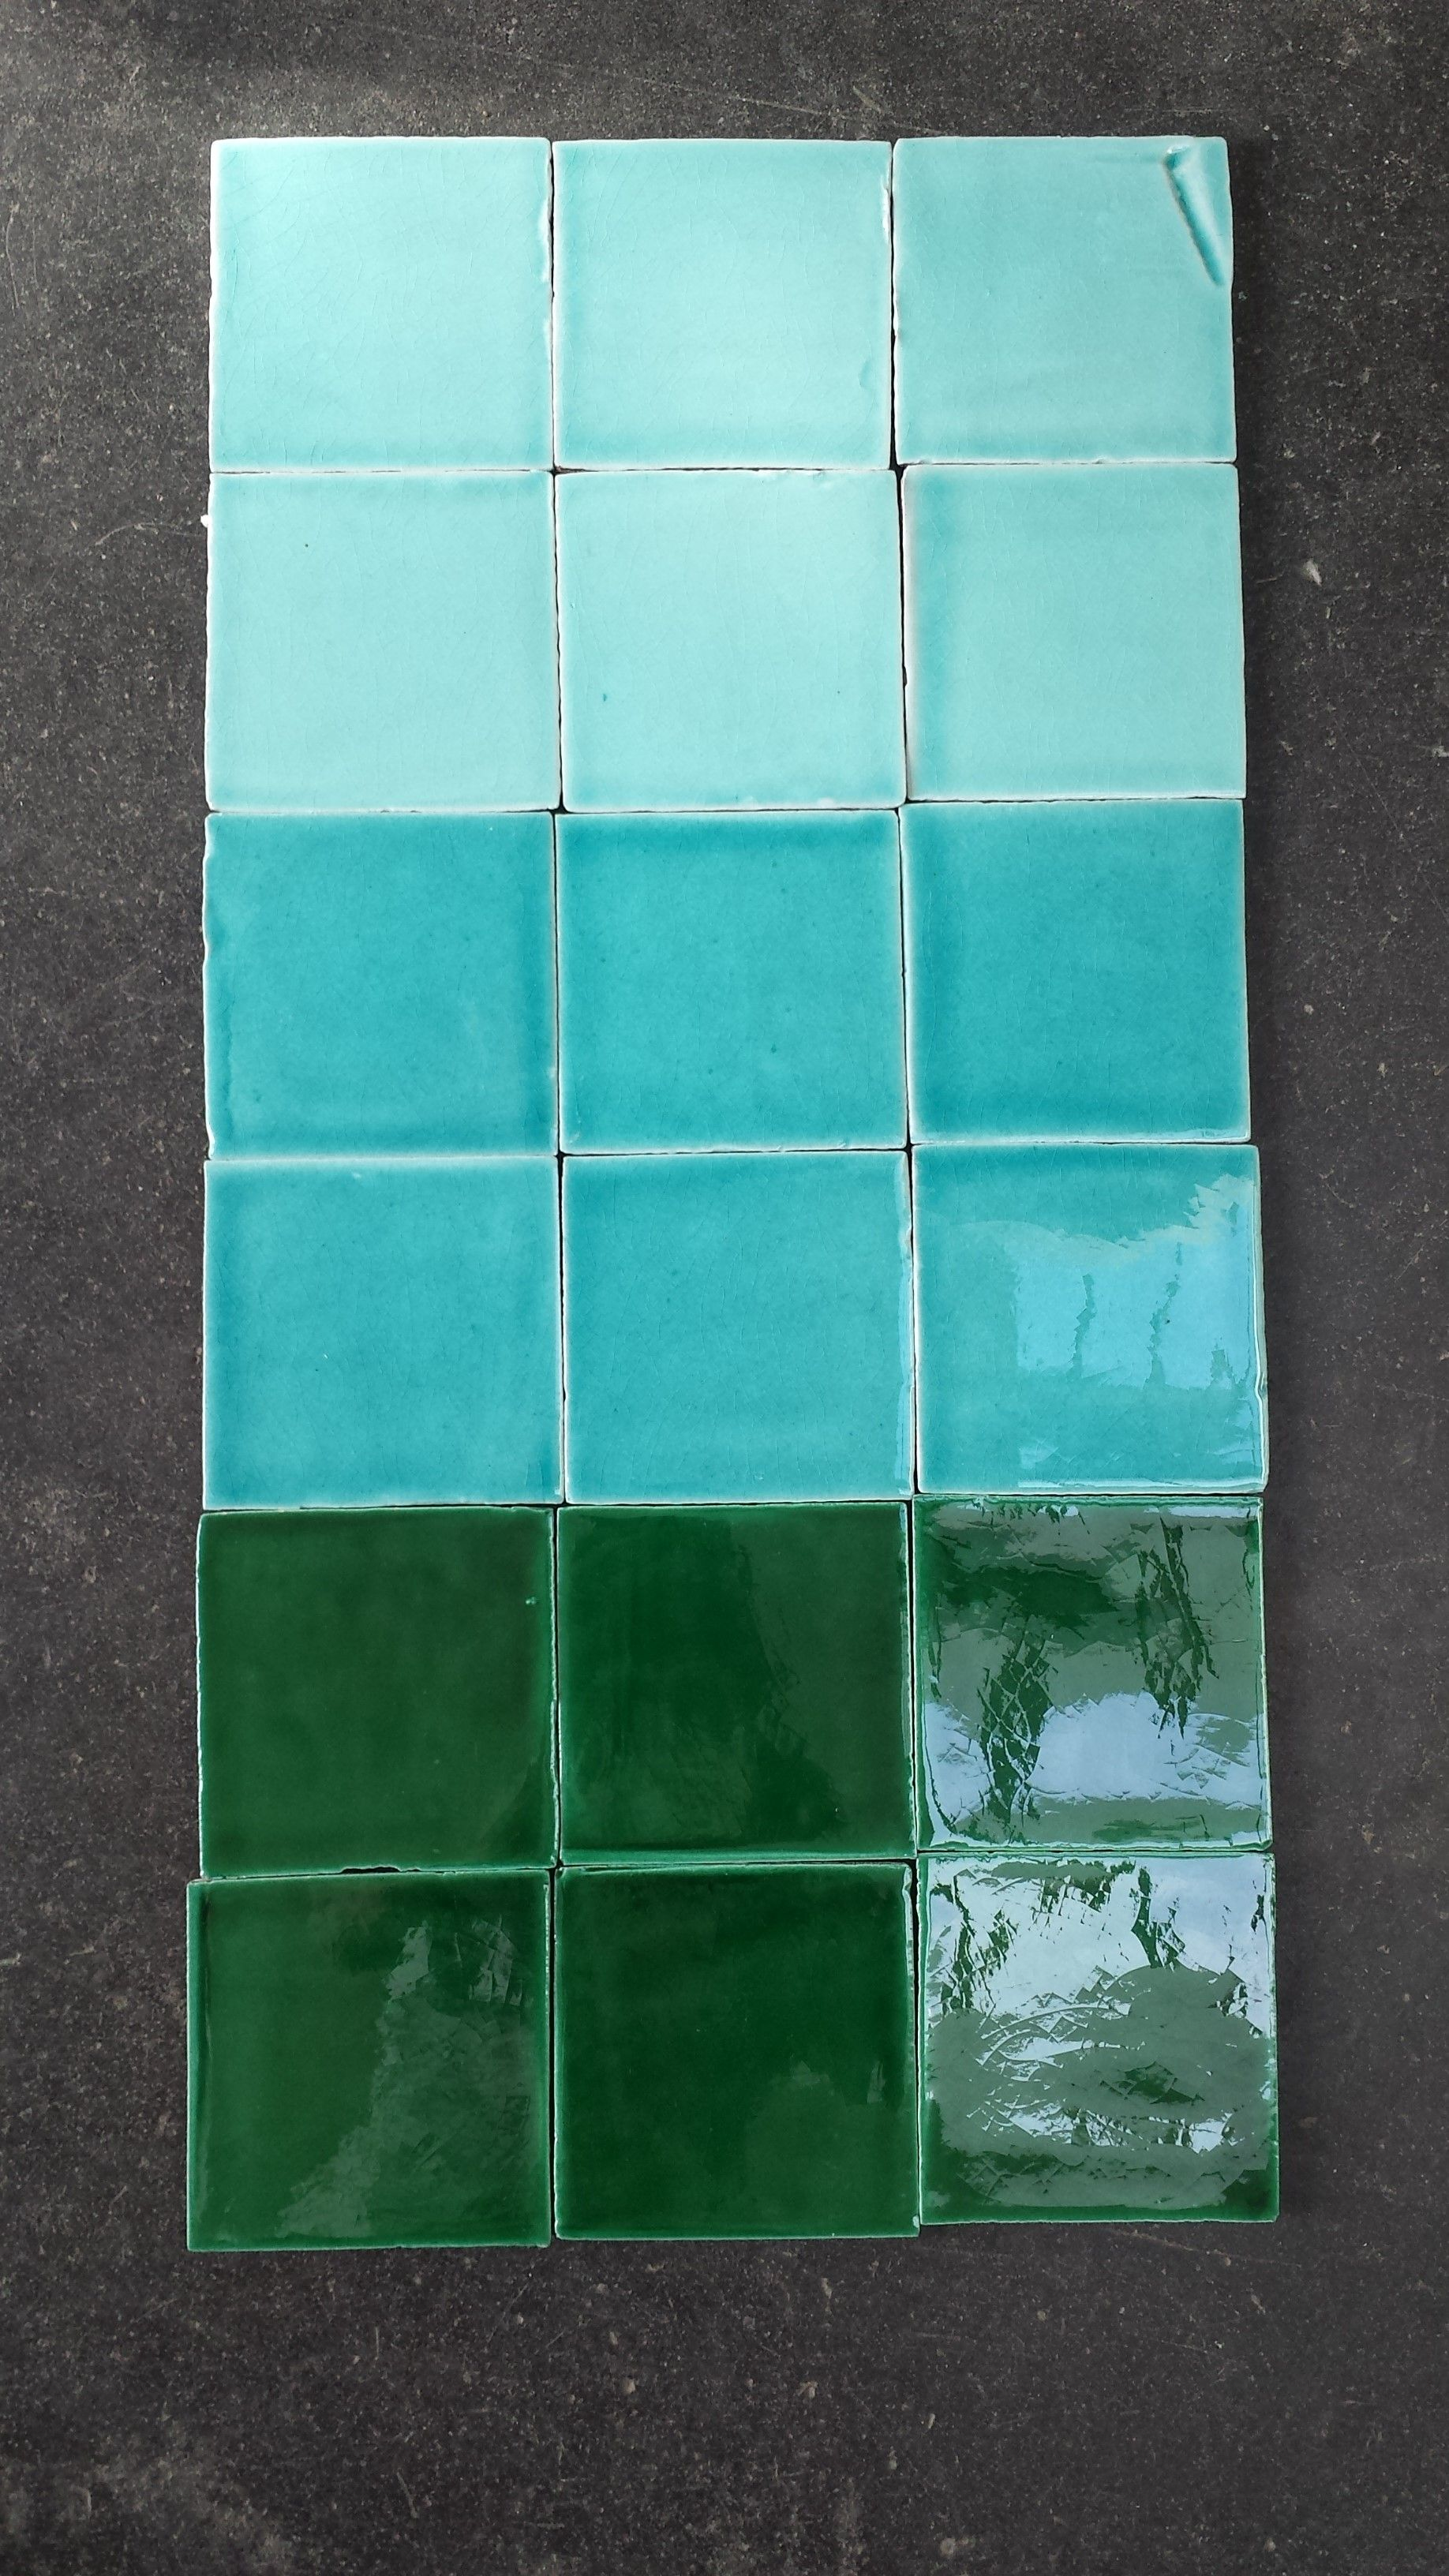 southern tiles handglazed terracotta 13x13 cm verde mar verde azulado verde cobre www. Black Bedroom Furniture Sets. Home Design Ideas